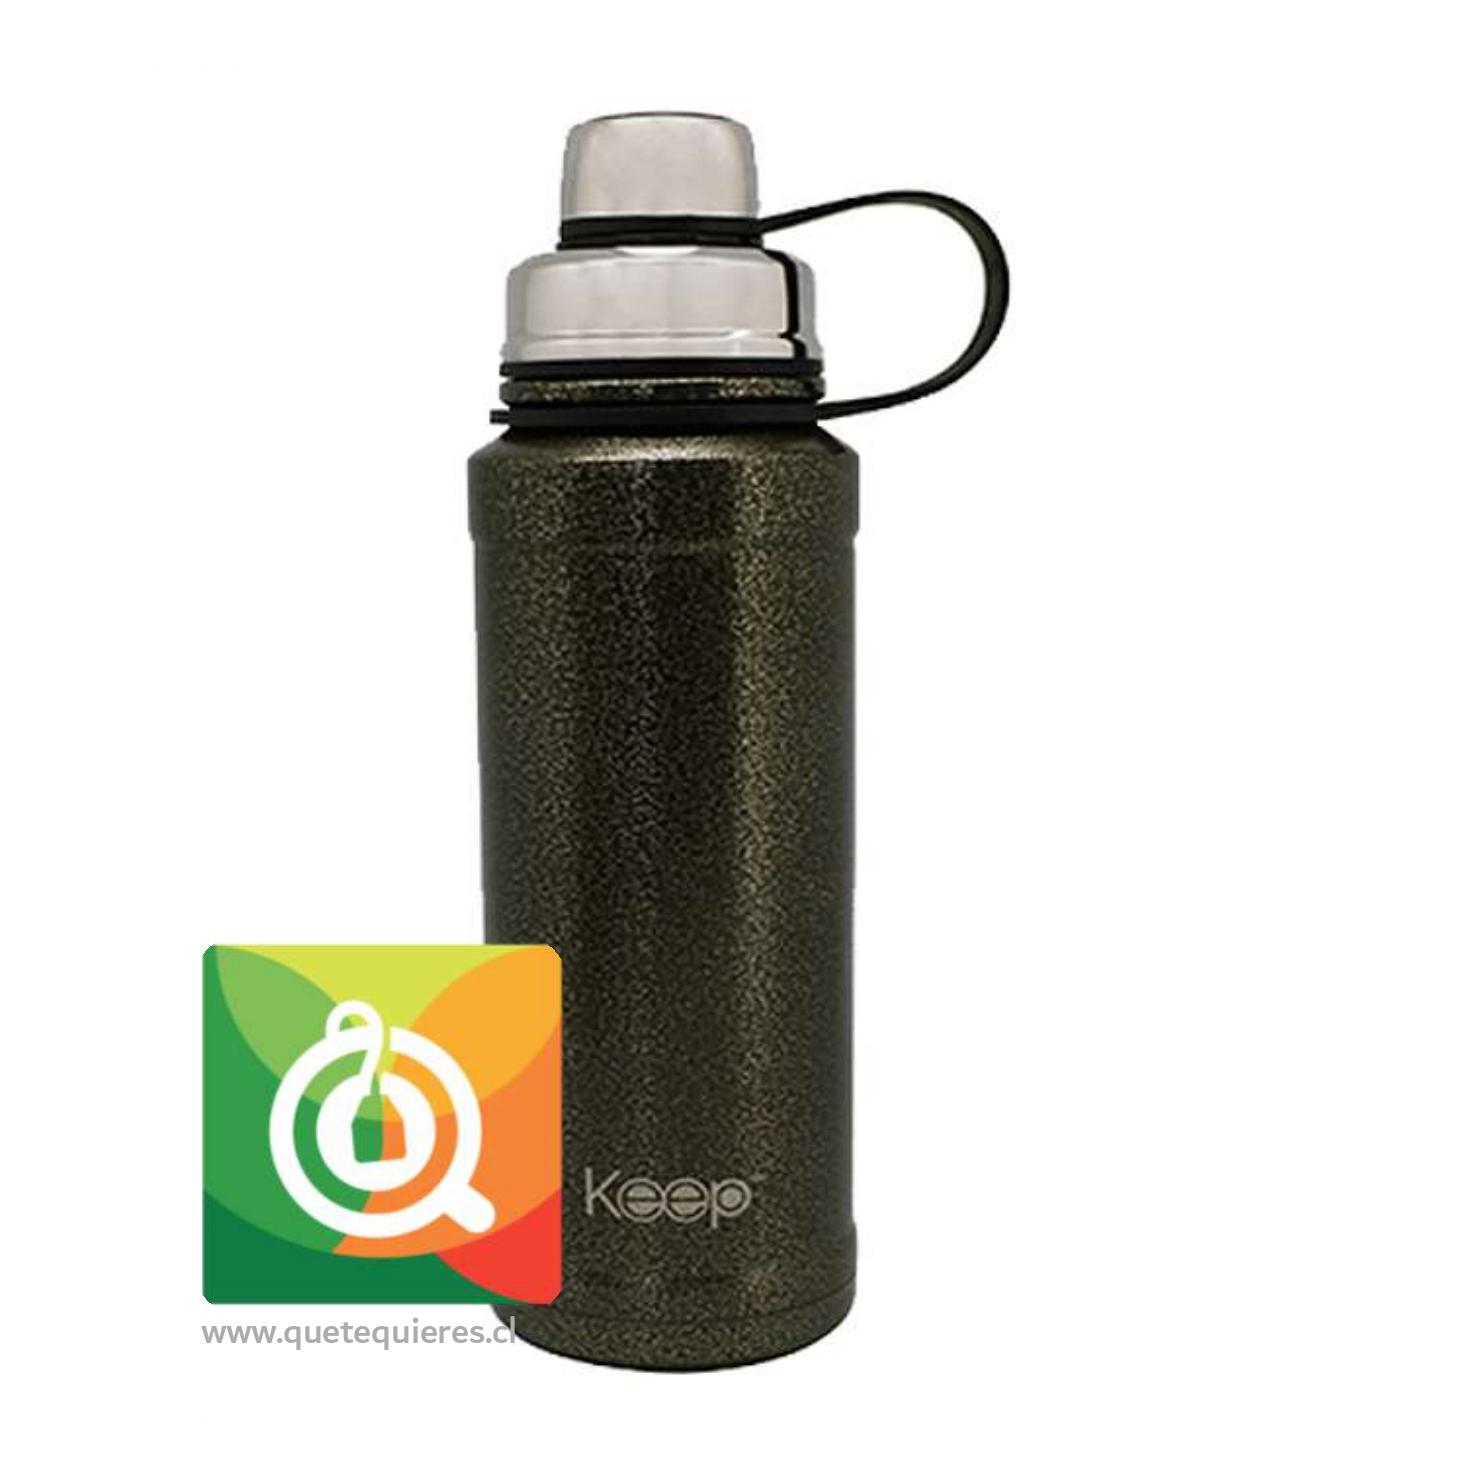 Keep Botella Termica Outdoor Verde Oscuro